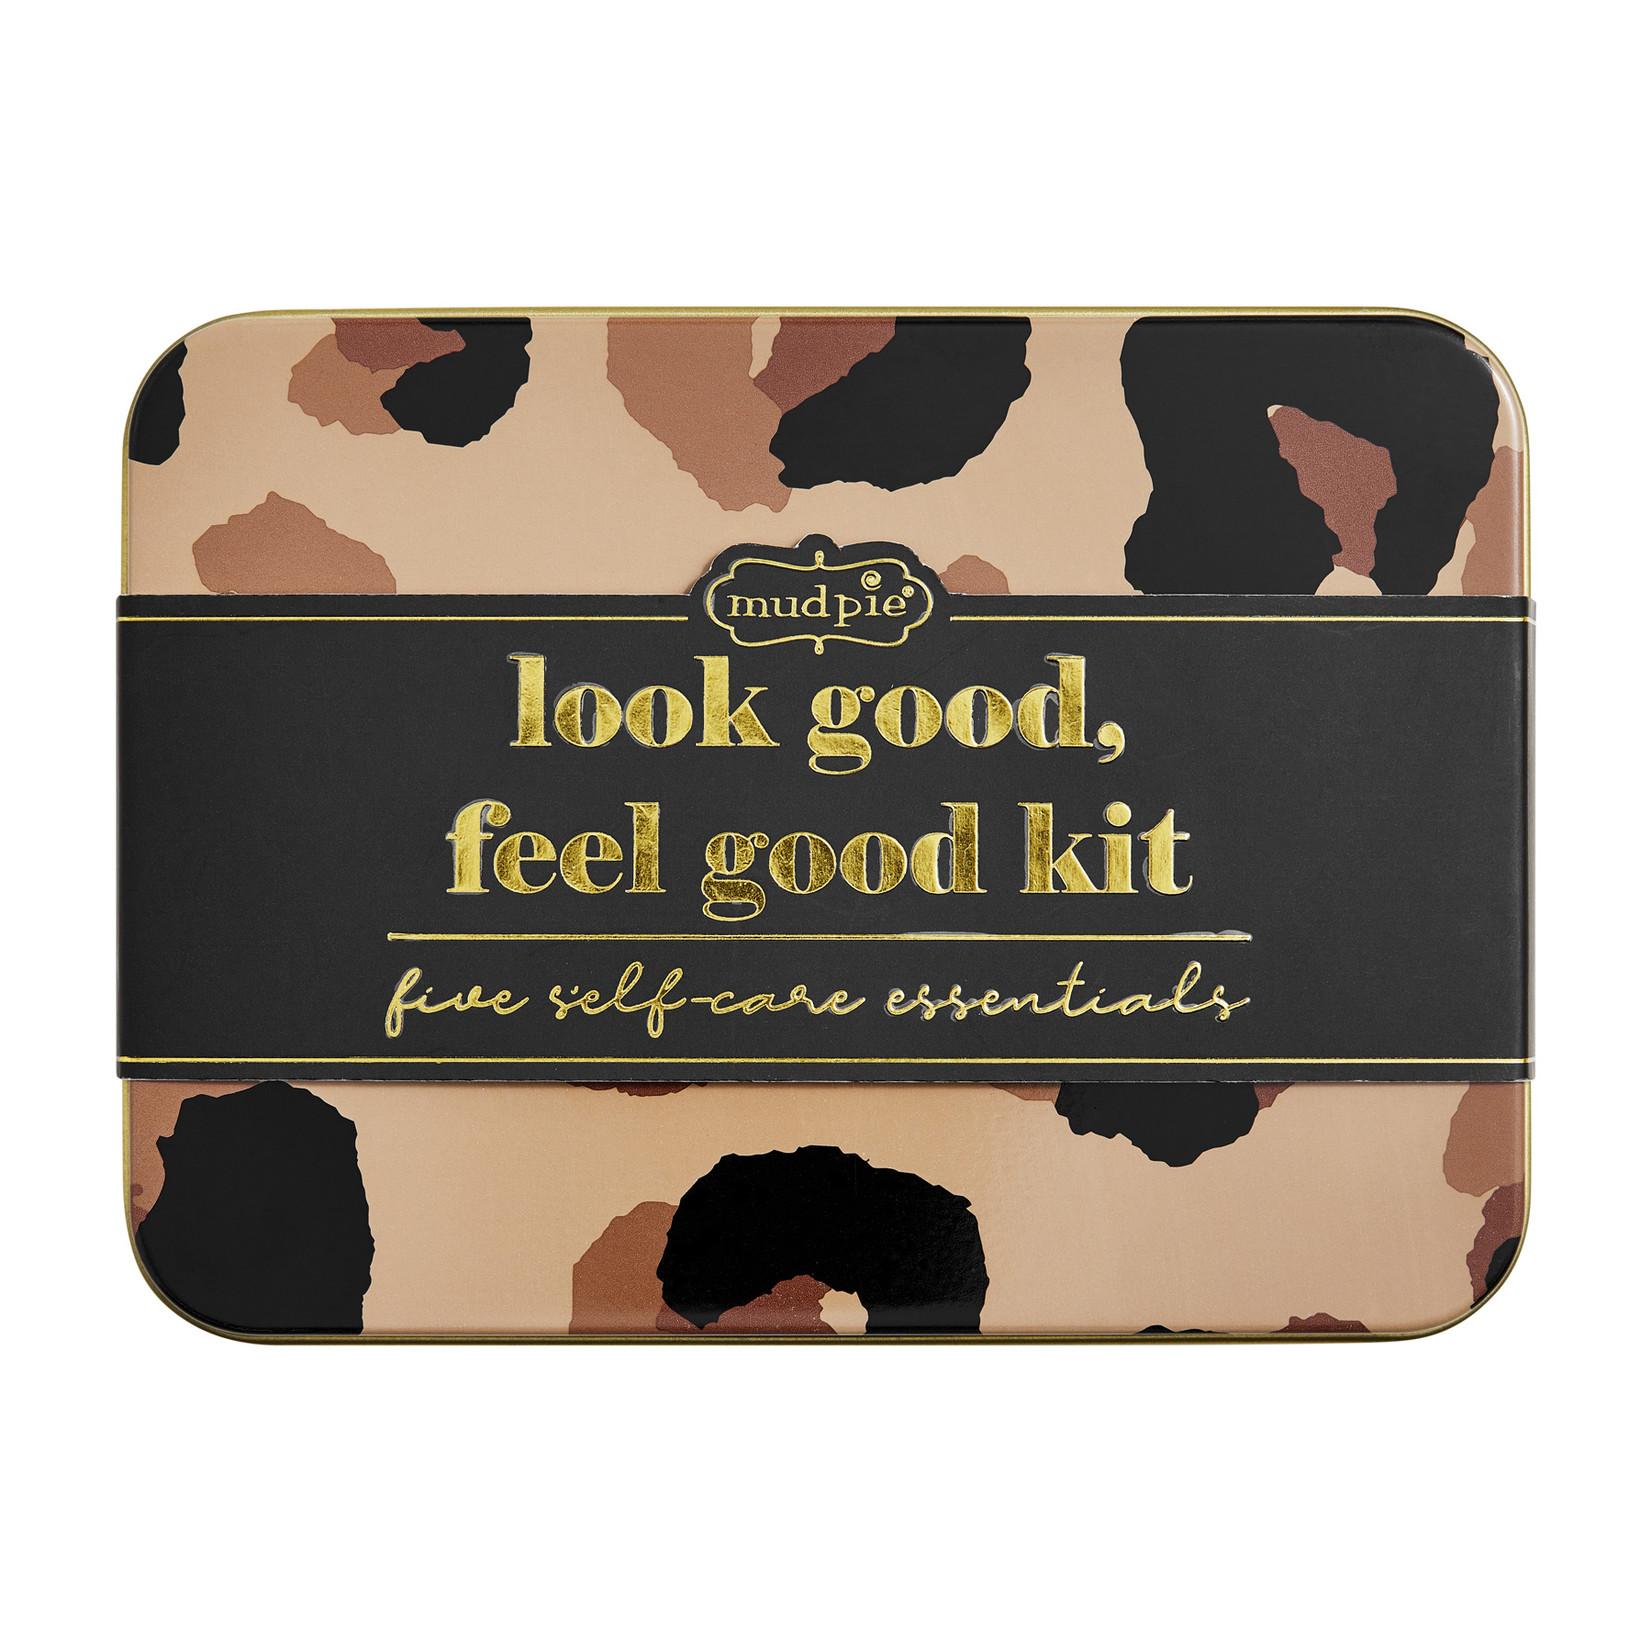 Self-Care Essential Kit